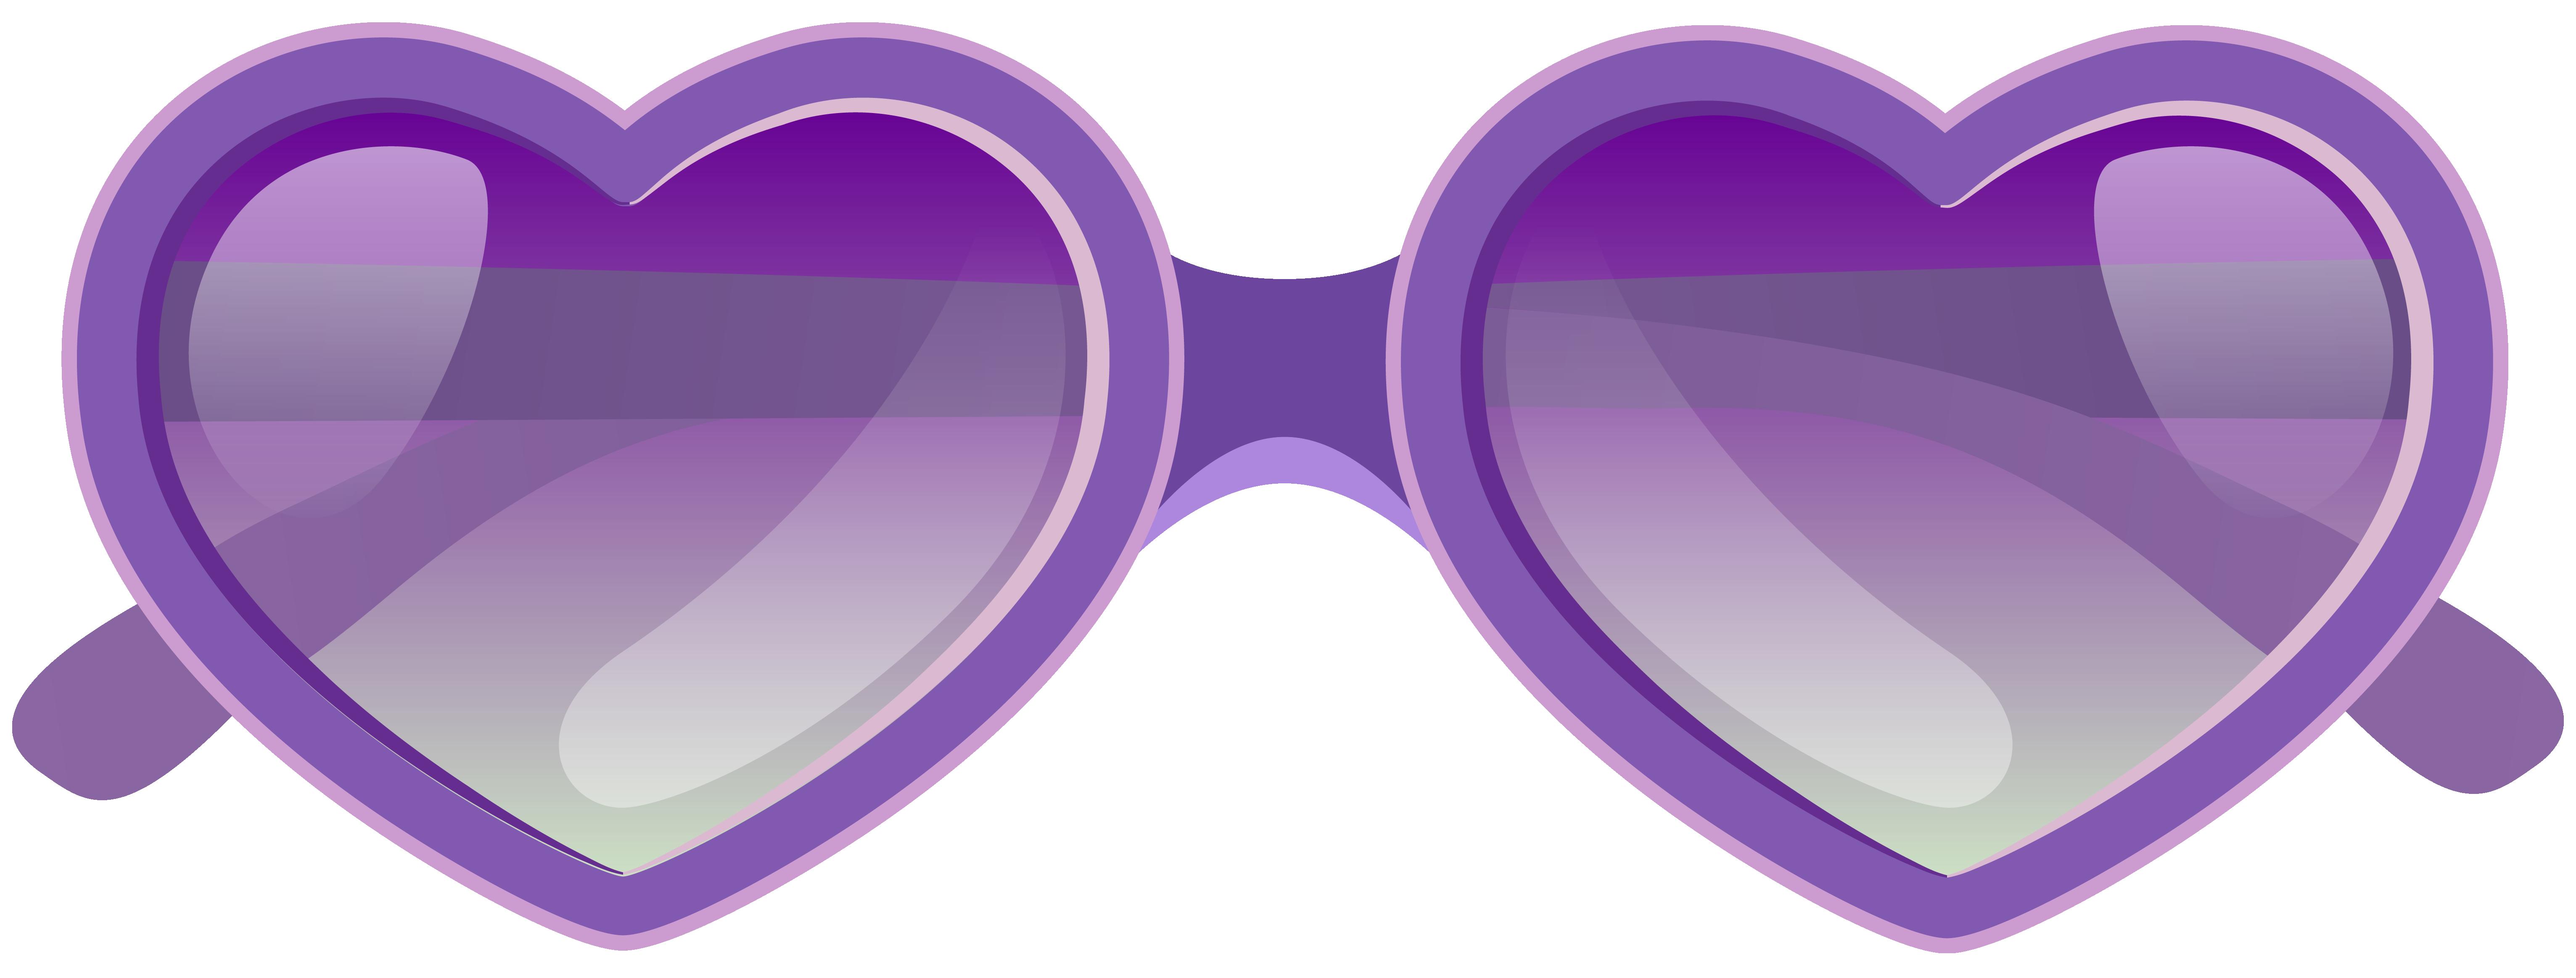 clip art free Goggles clipart beach. Purple heart sunglasses png